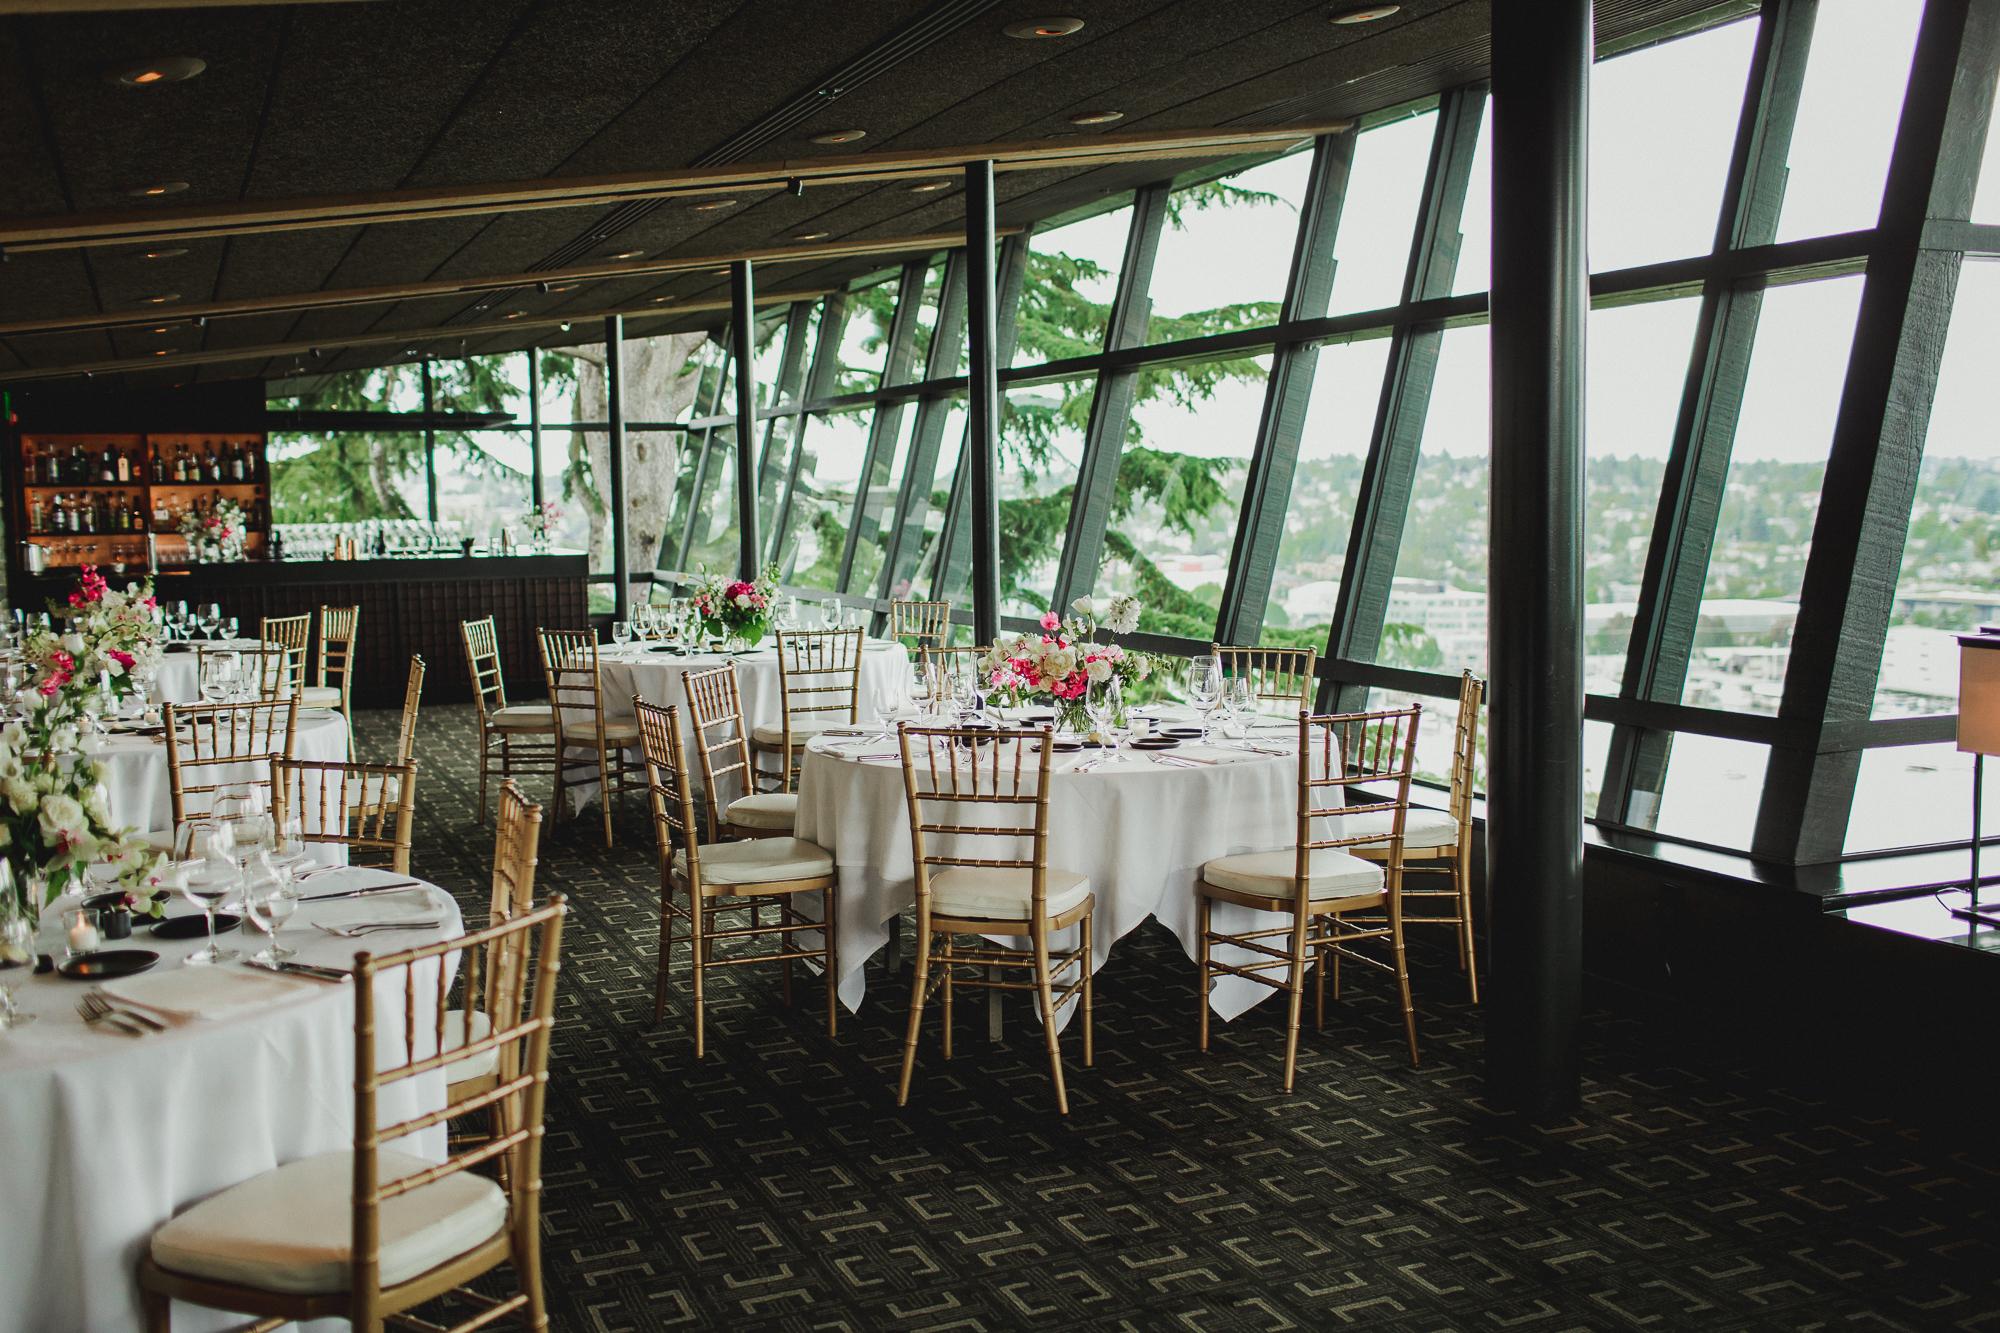 canlis restaurant wedding photos by Krista Welch-0034.jpg